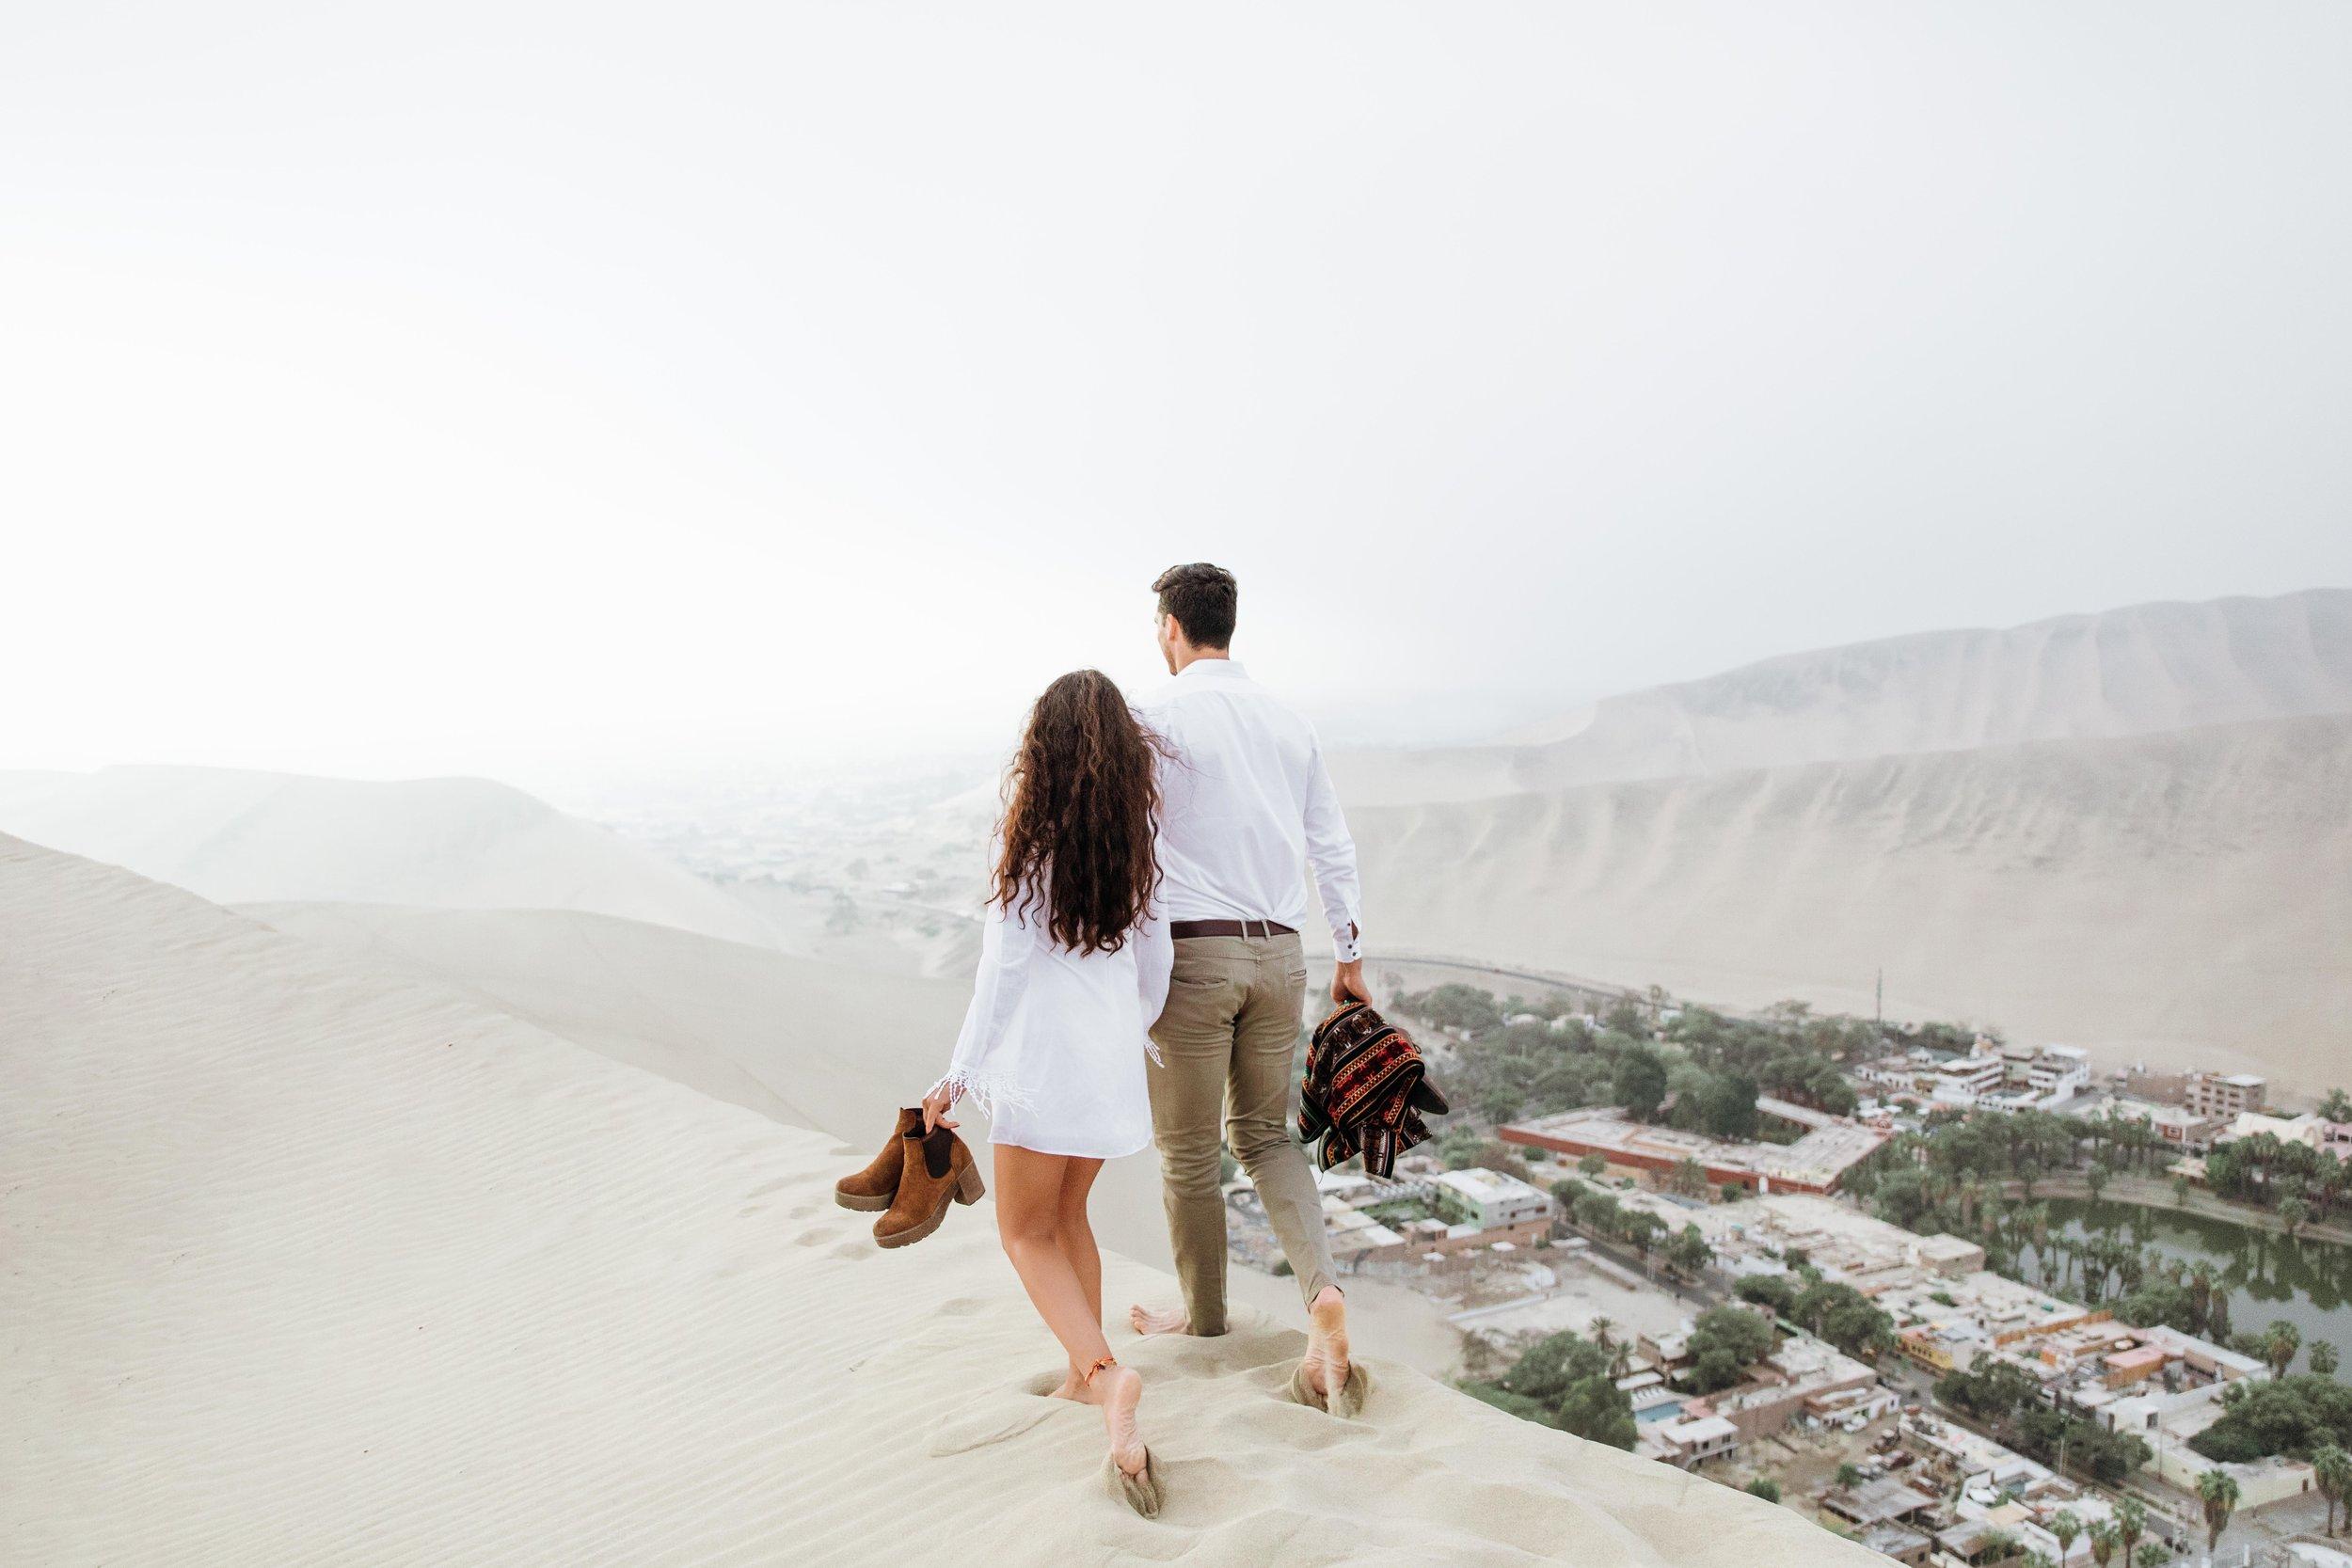 huacachina-peru-honeymoon-elopement-destination-wedding-photography-michael-cozzens-17.jpg